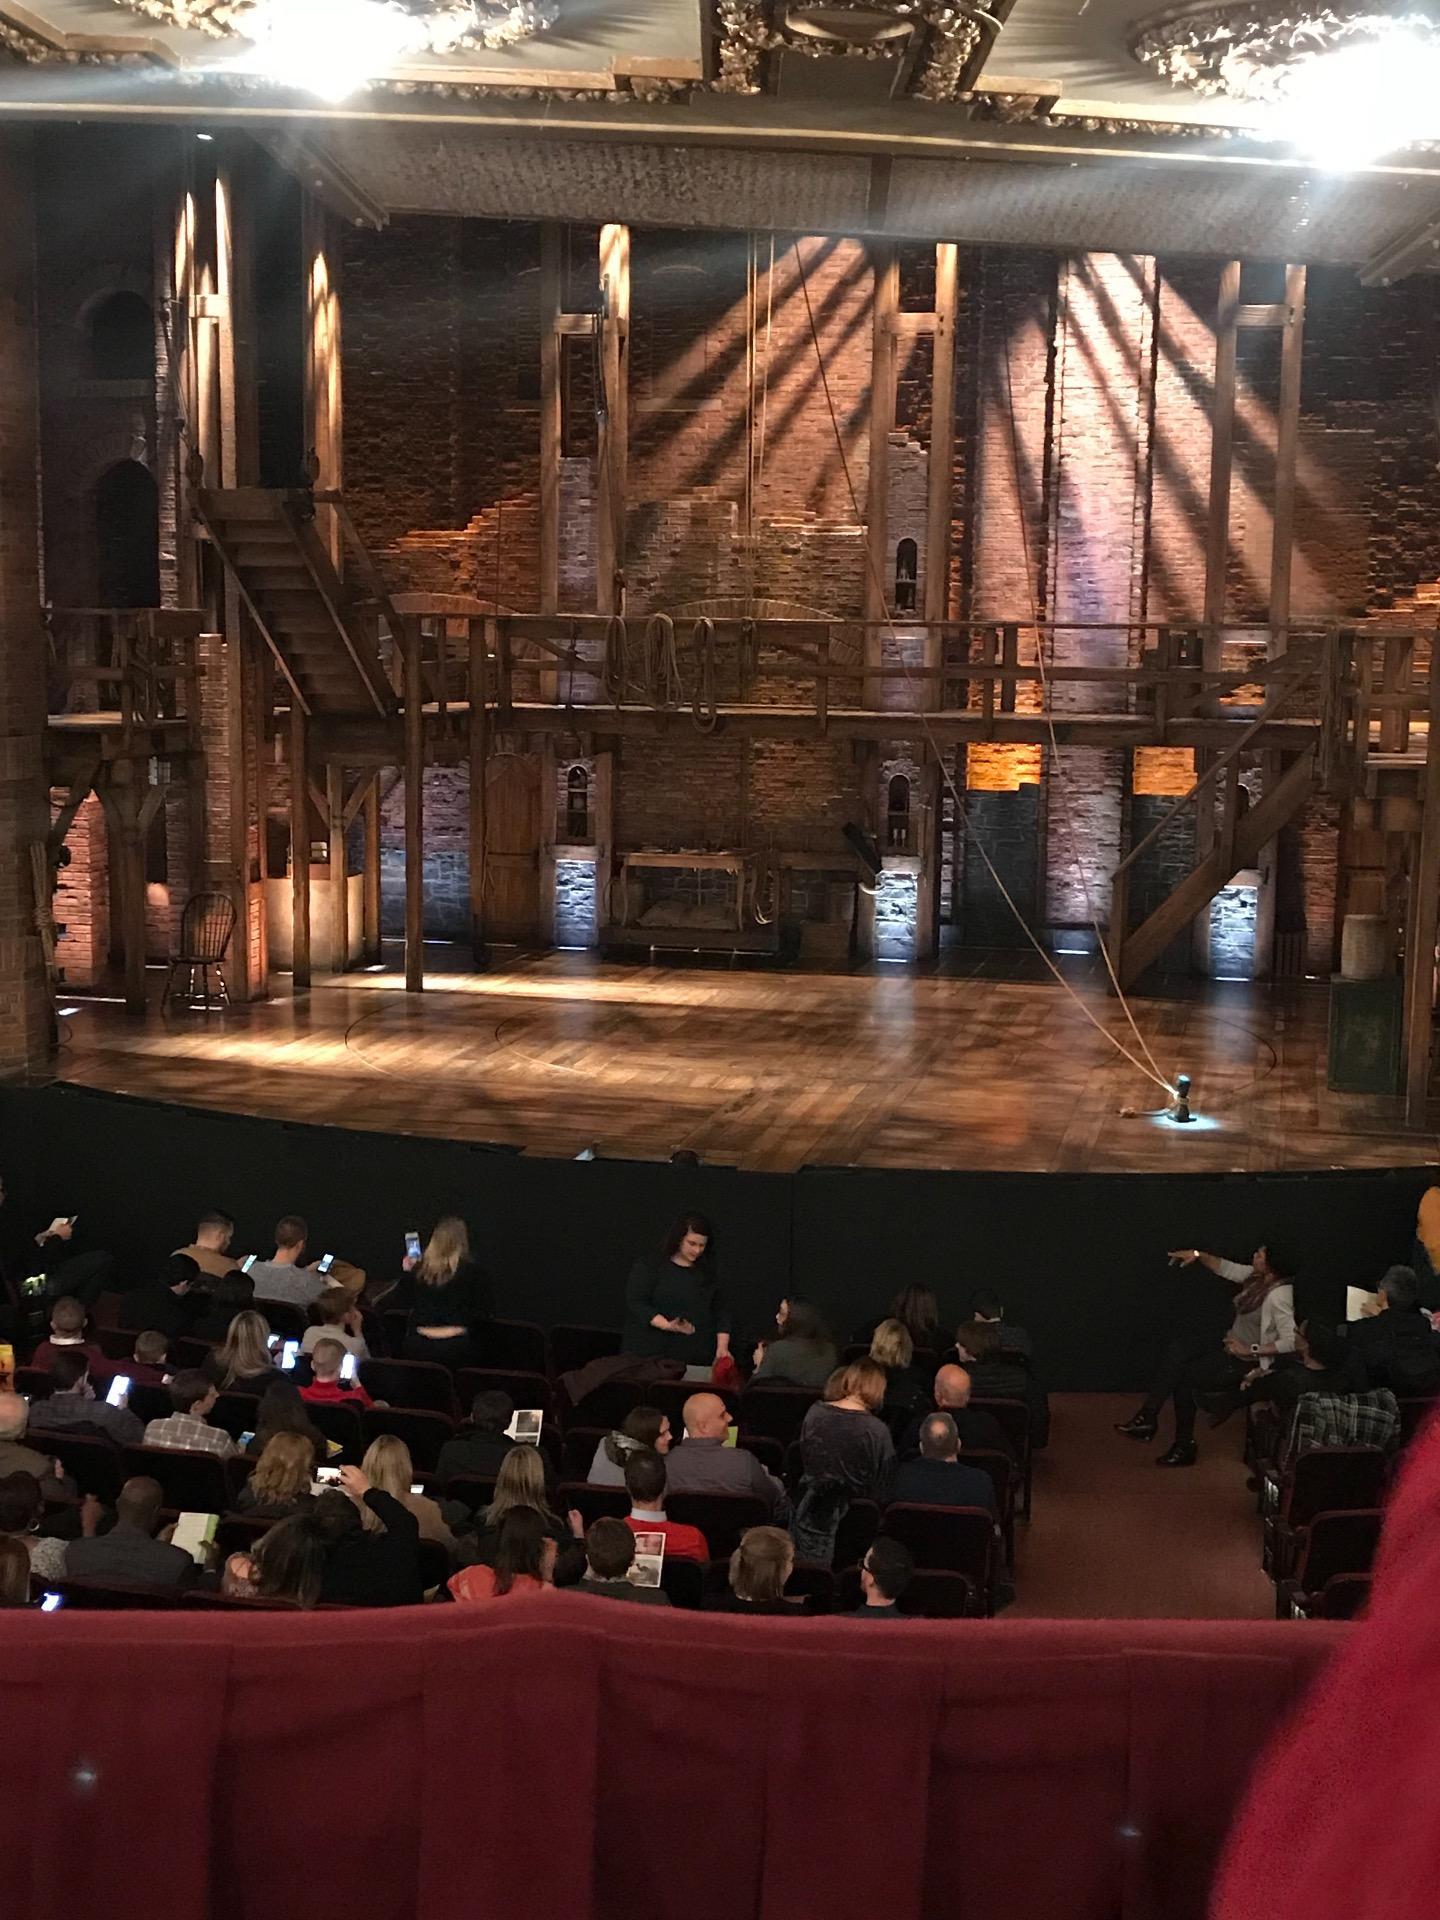 CIBC Theatre Section DRCR-RC Row B Seat 222